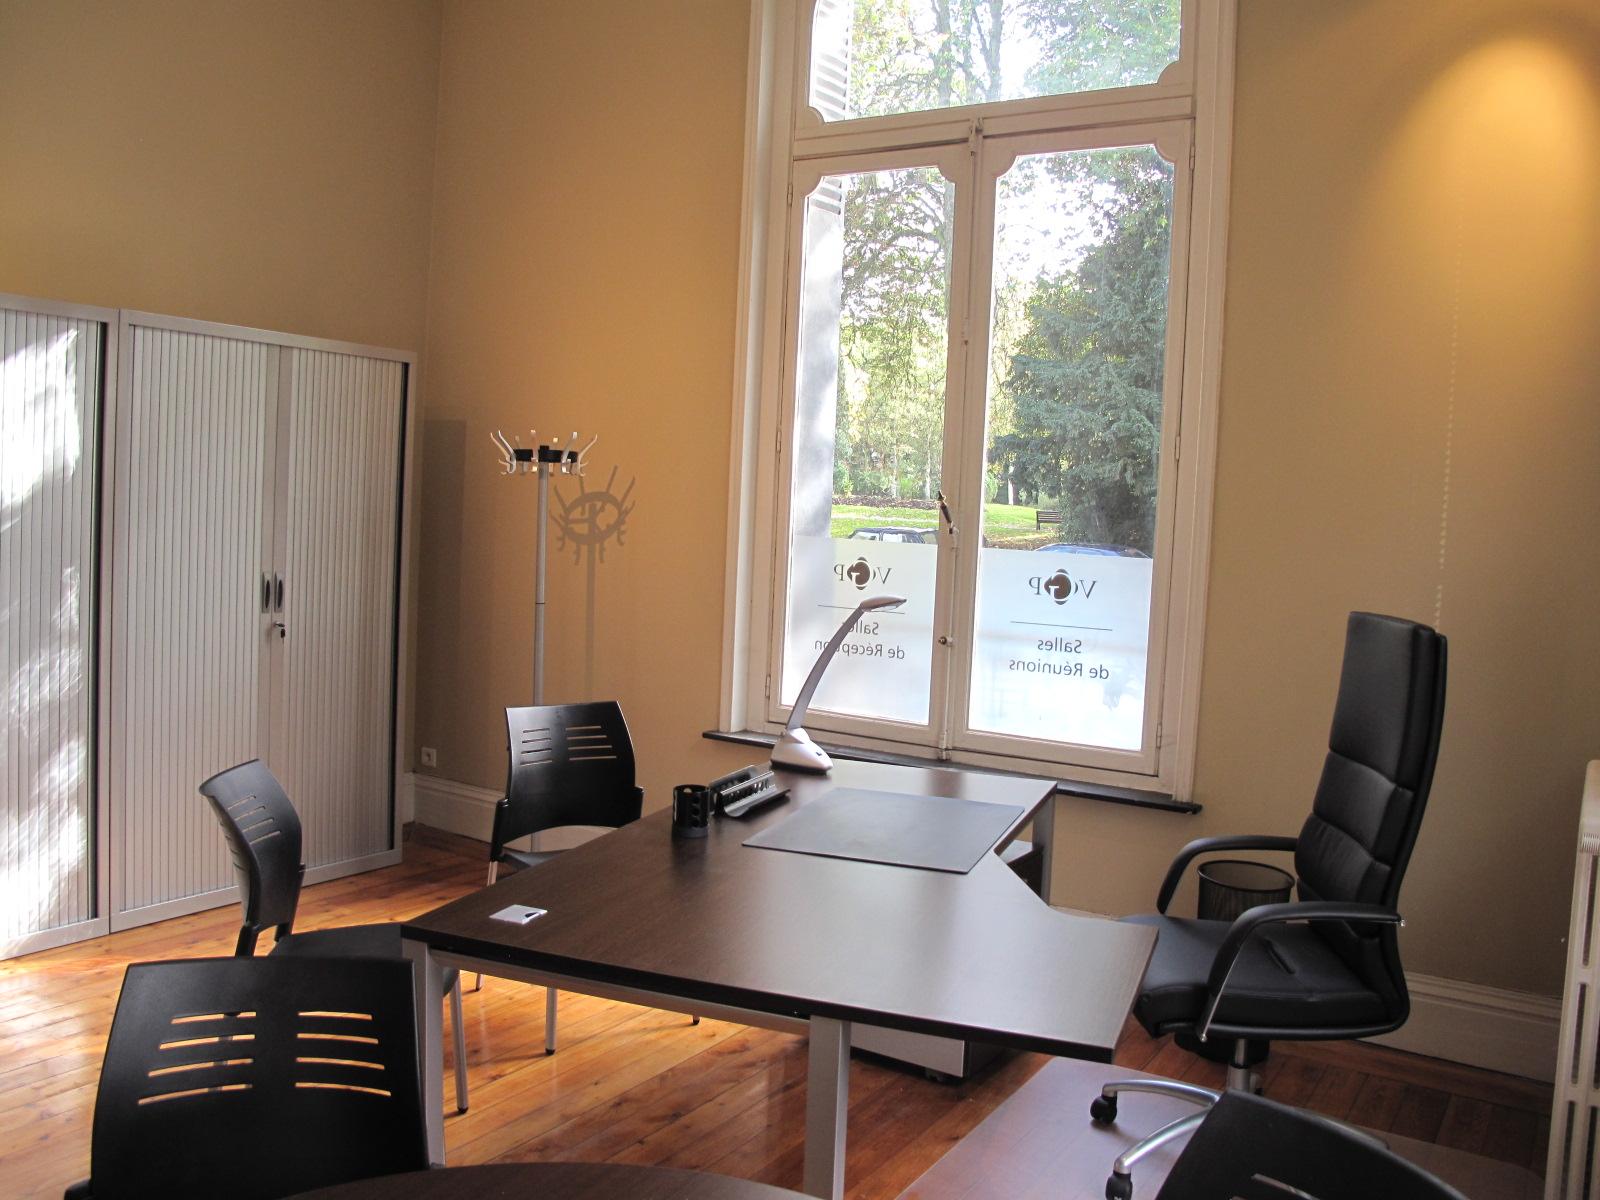 location de bureaux quip s valenciennes. Black Bedroom Furniture Sets. Home Design Ideas